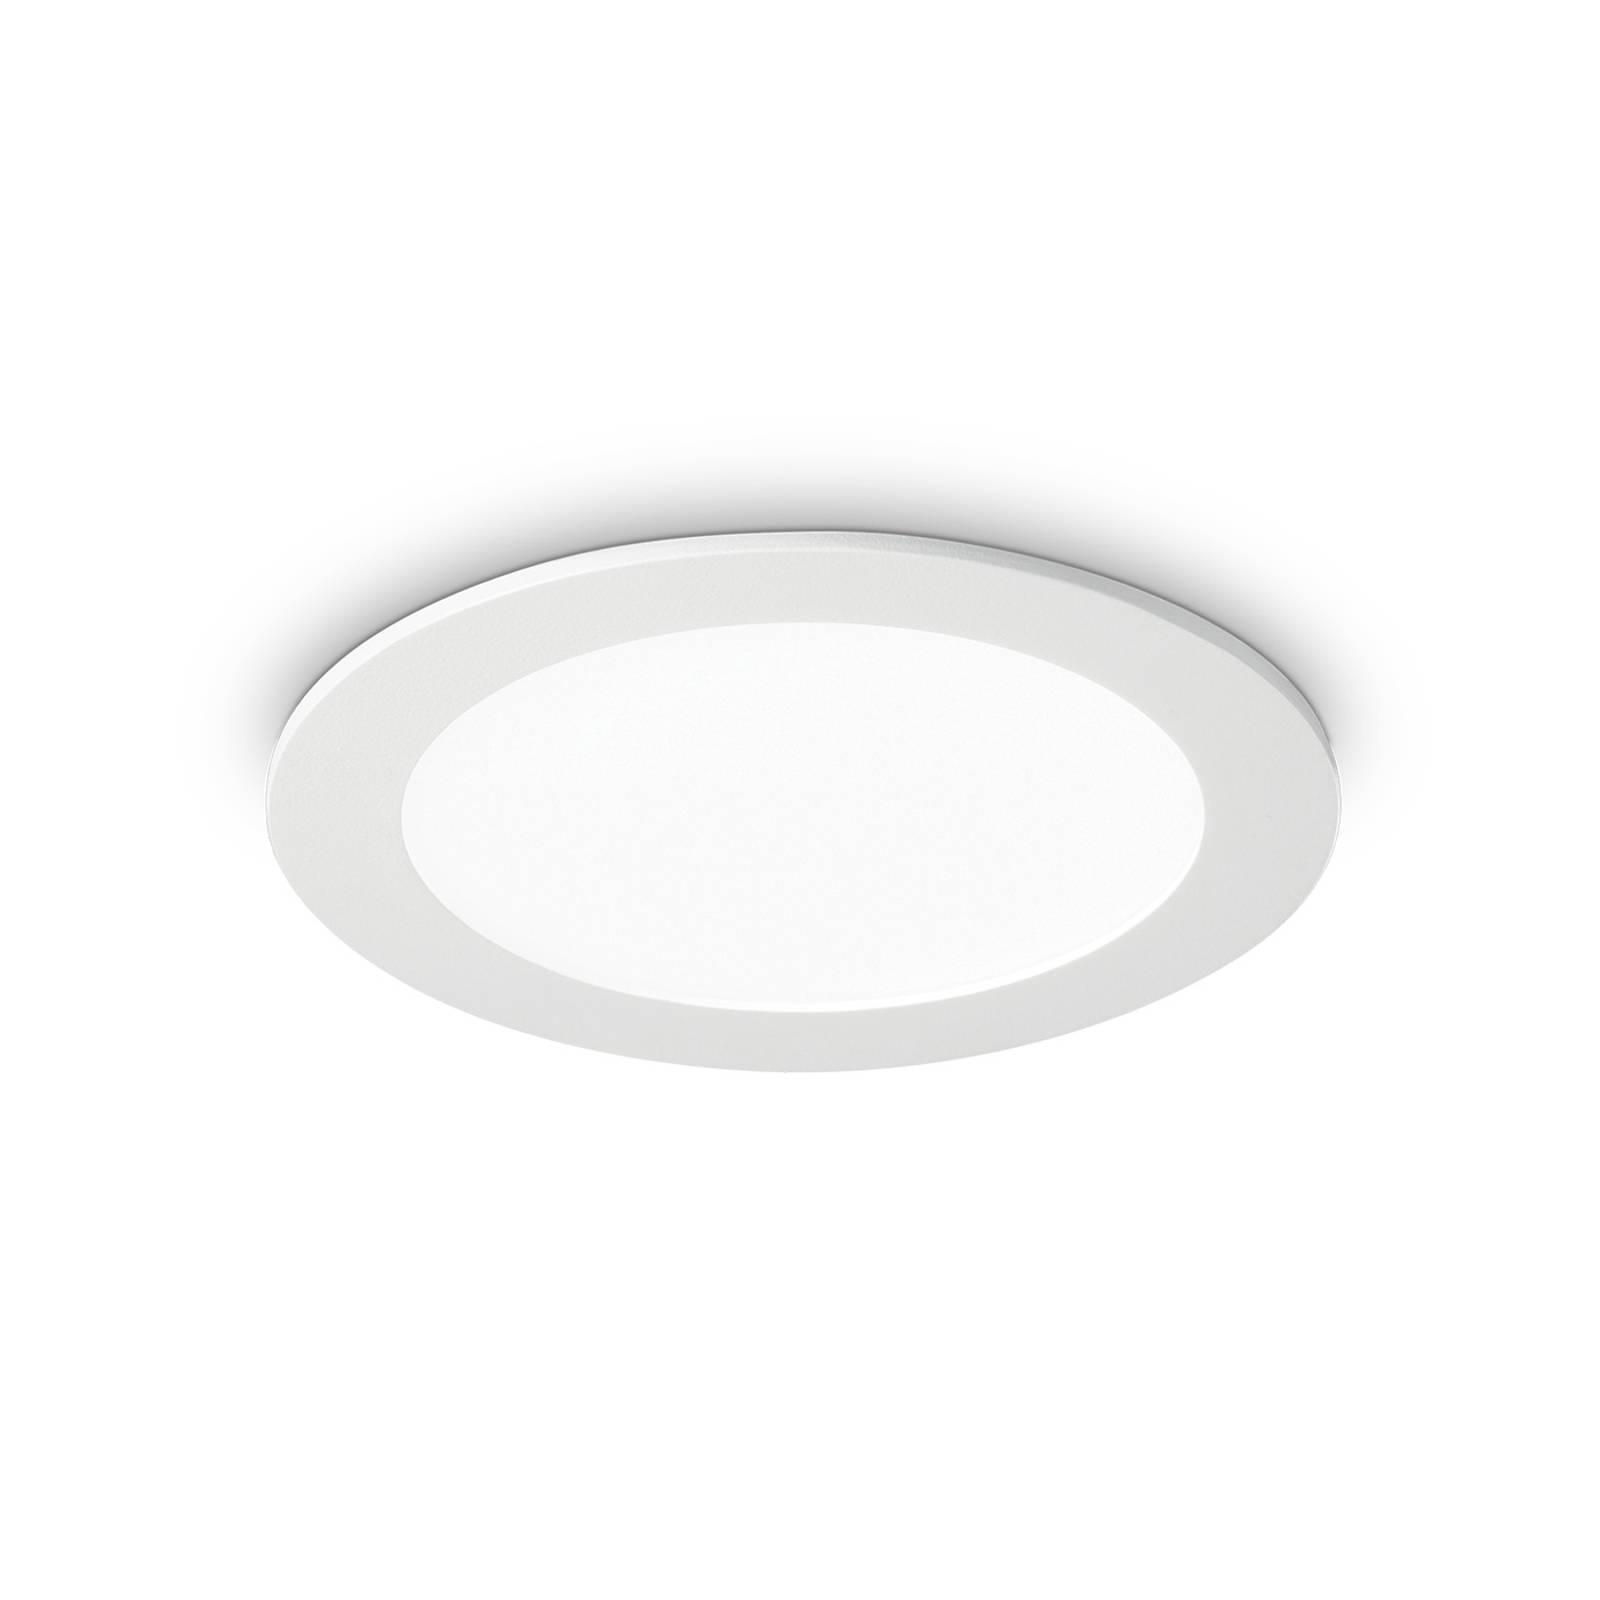 Lampa sufitowa LED Groove round 3000K 11,8cm